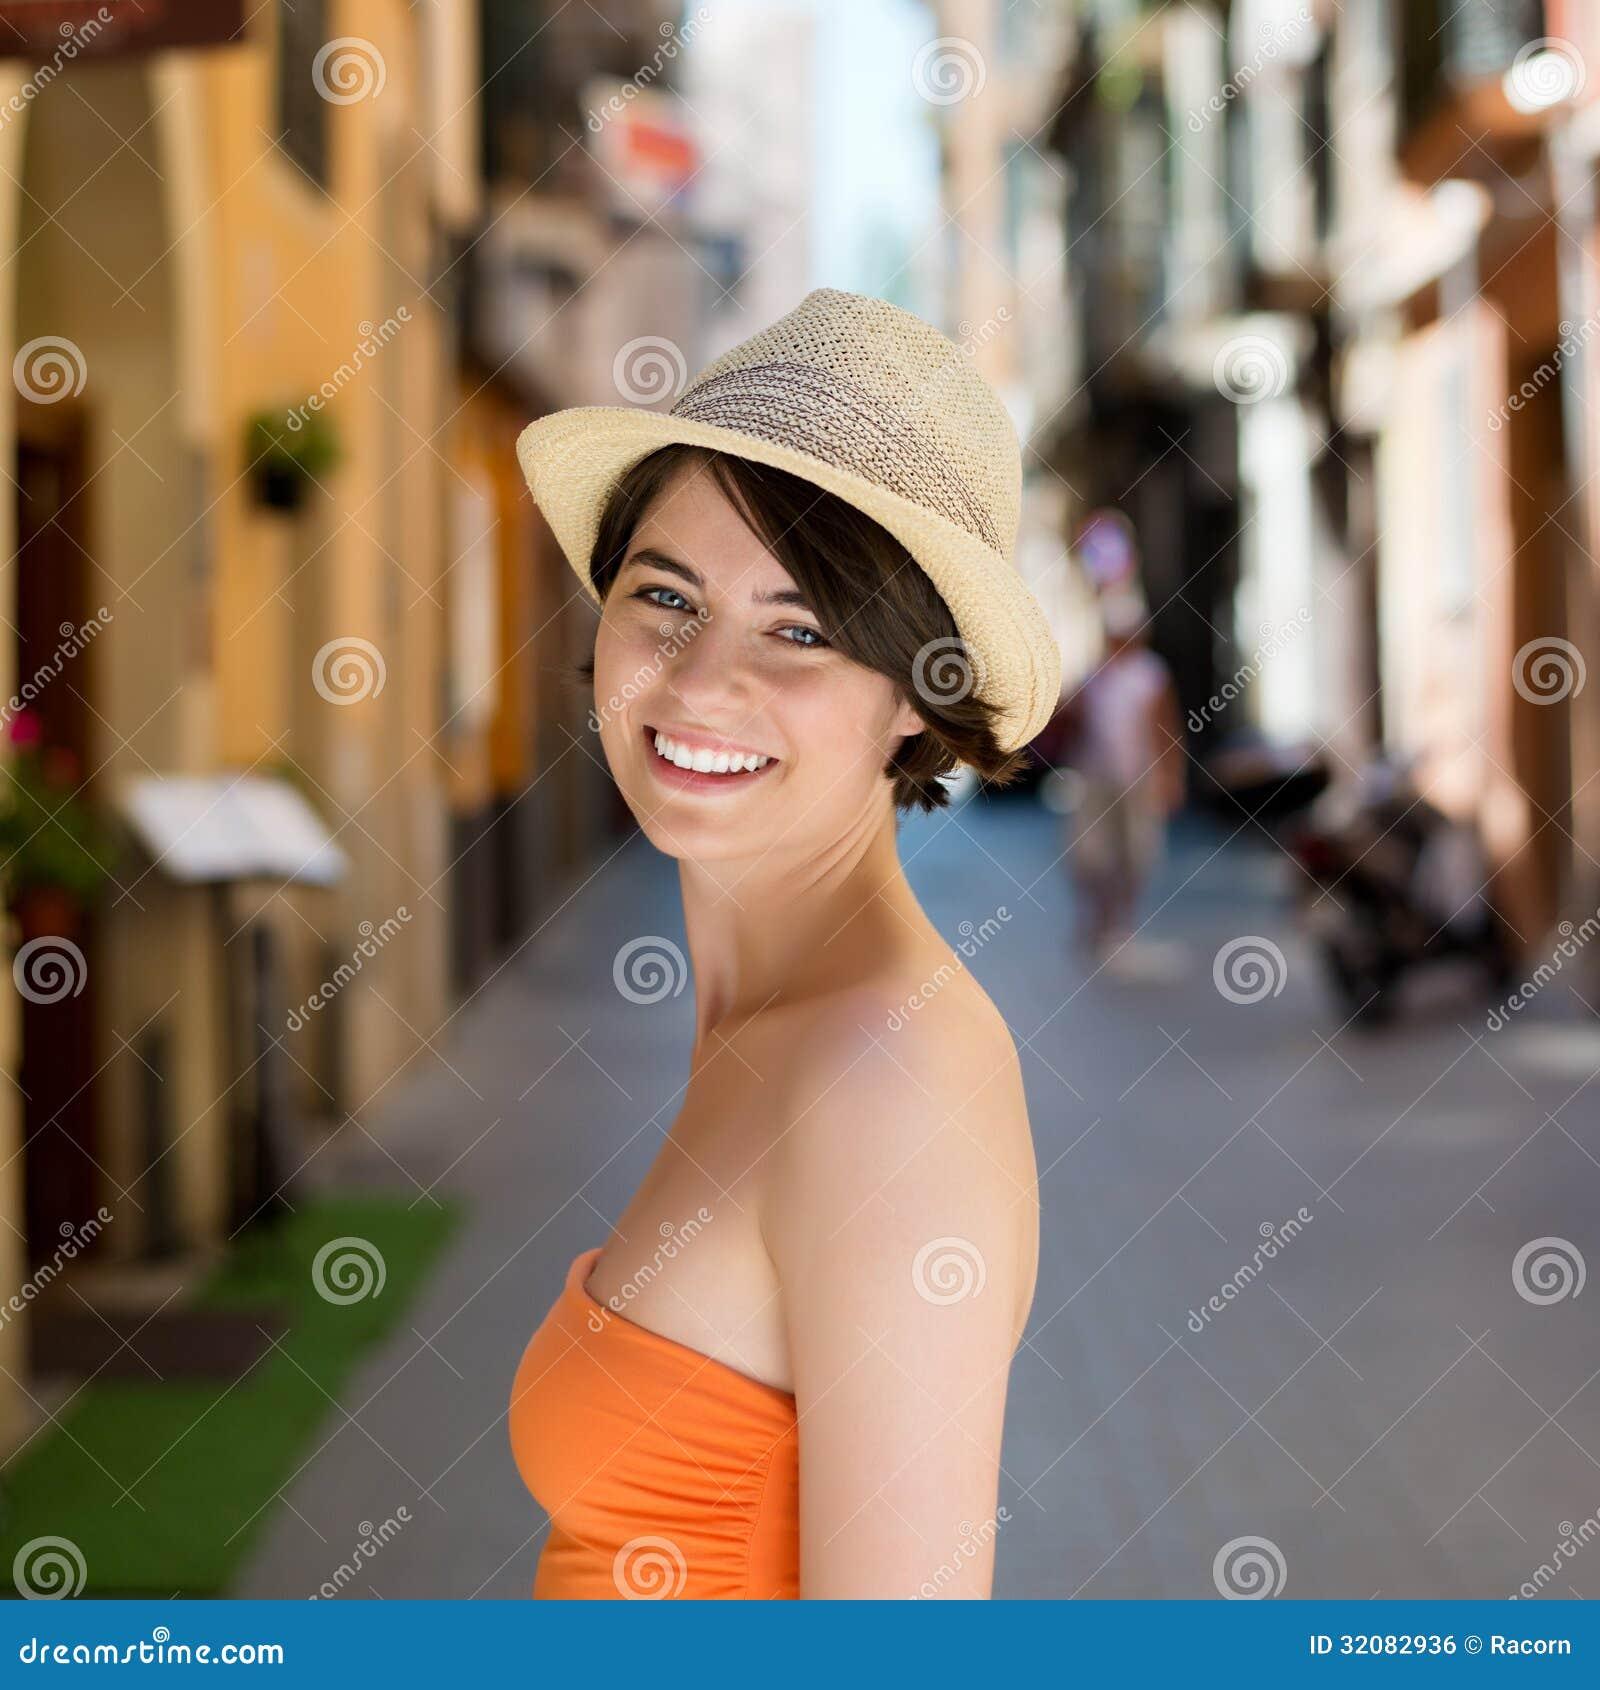 palma de mallorca single women Dating palma de mallorca single staten island girls seeking italians interested in, mature dating in brighton, sussex, meet women from sussex meeting his friends.